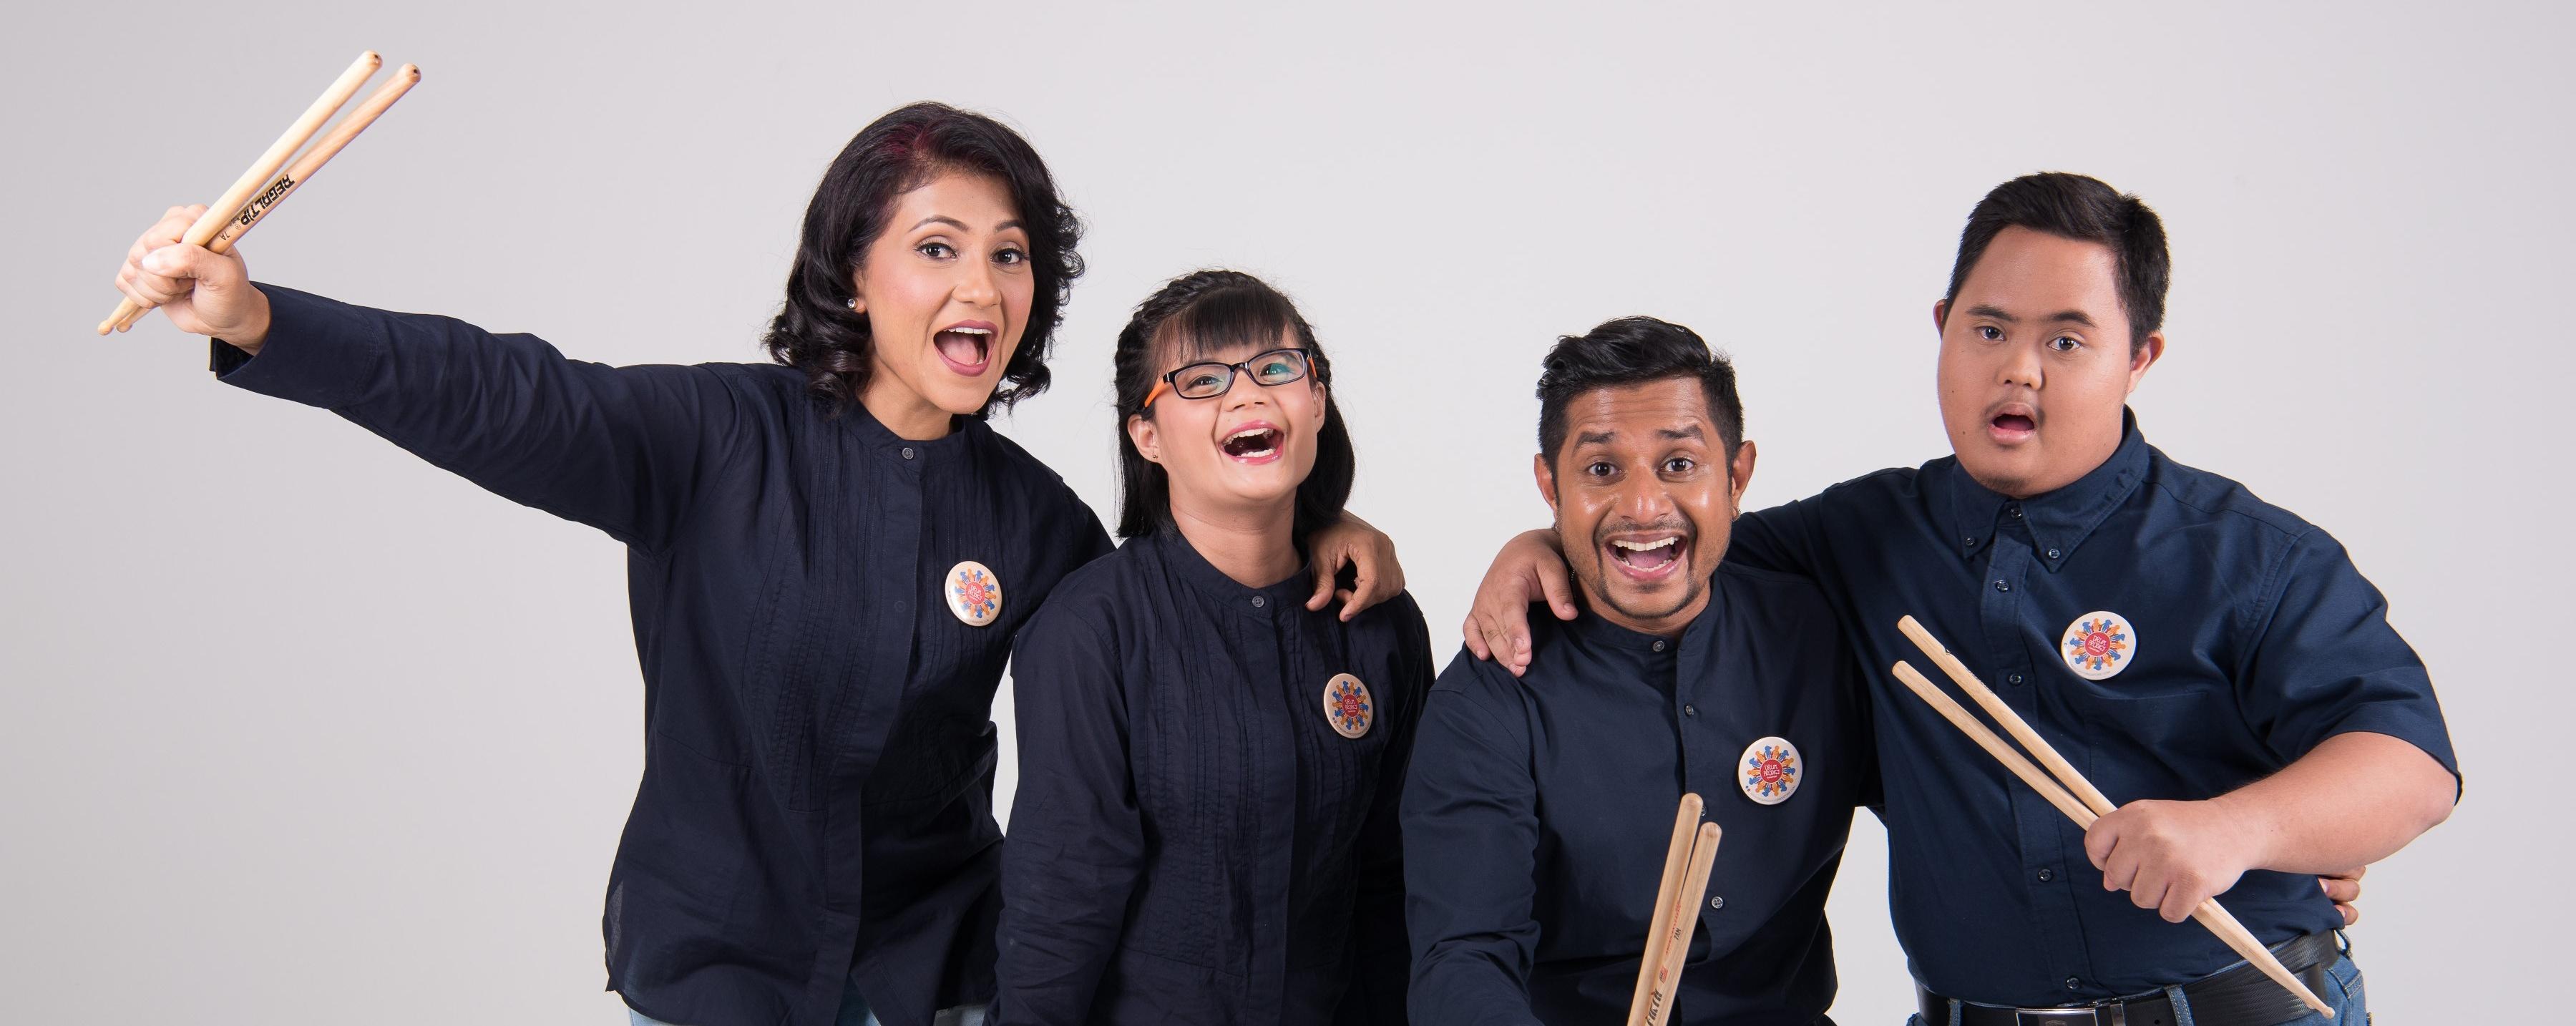 Esplanade Presents: Red Dot August - Drum Prodigy Singapore Inclusive Ensemble